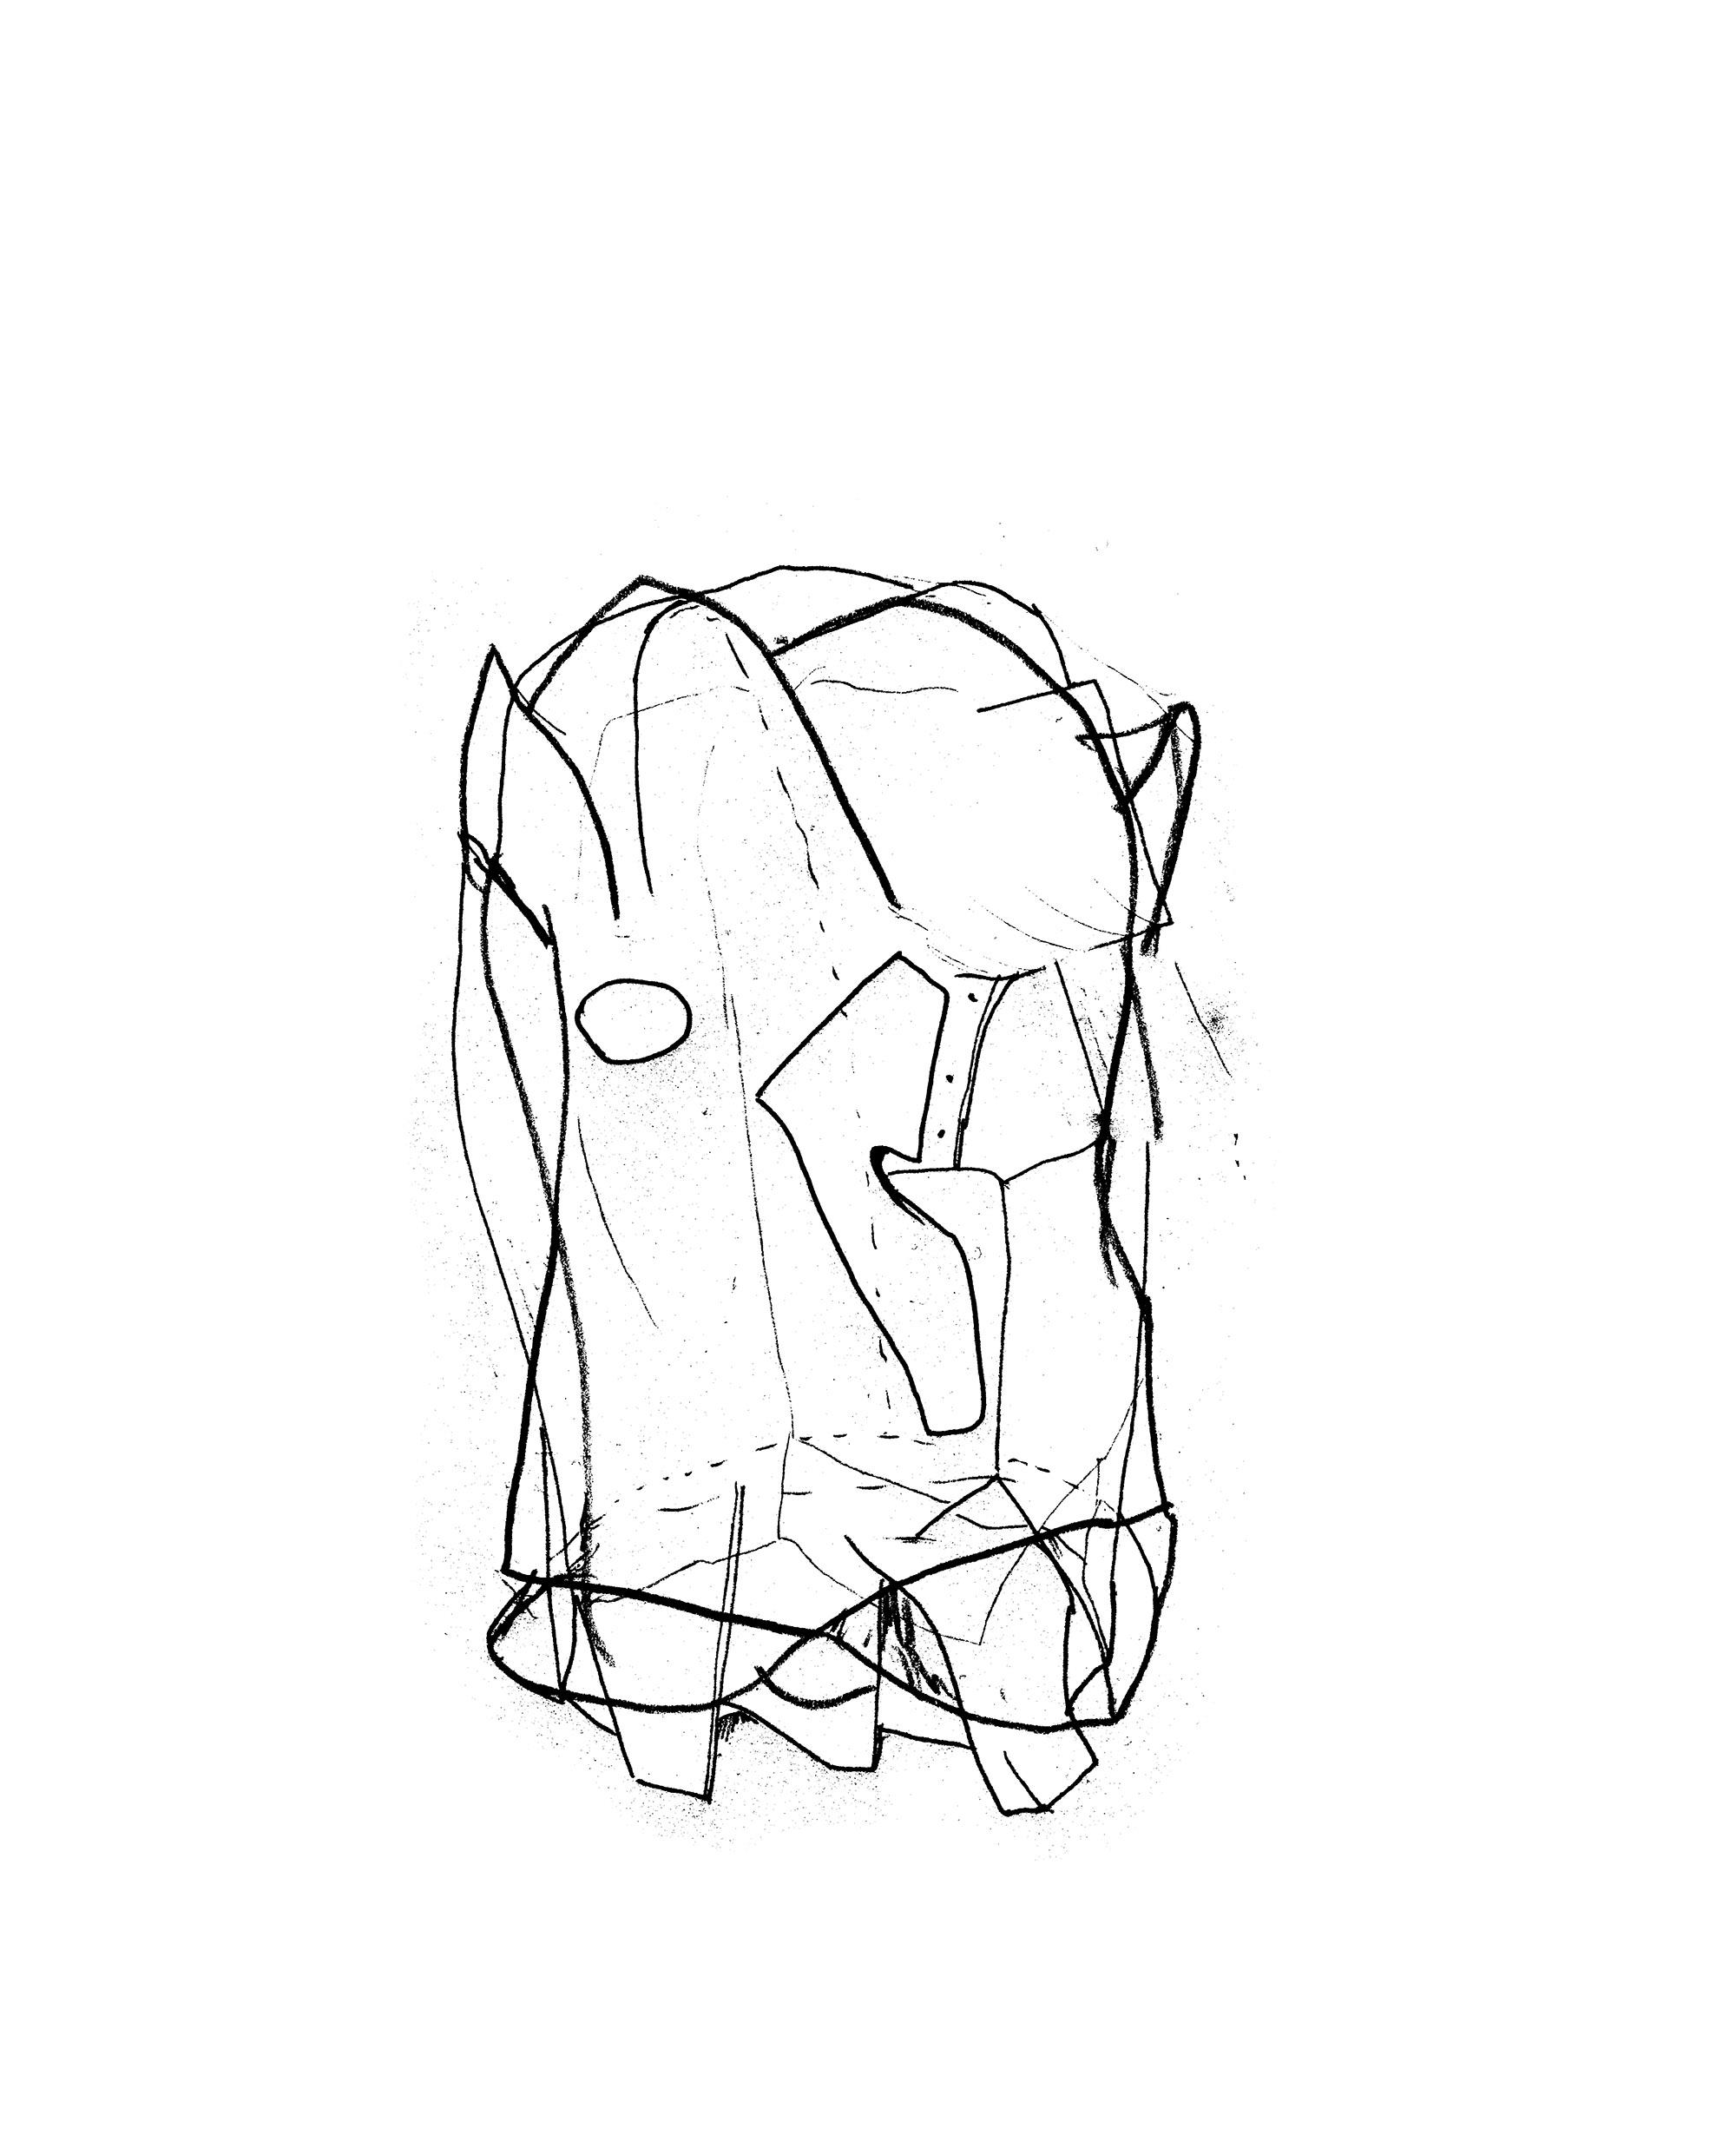 new-sculptures-shape-drawing-03.jpg